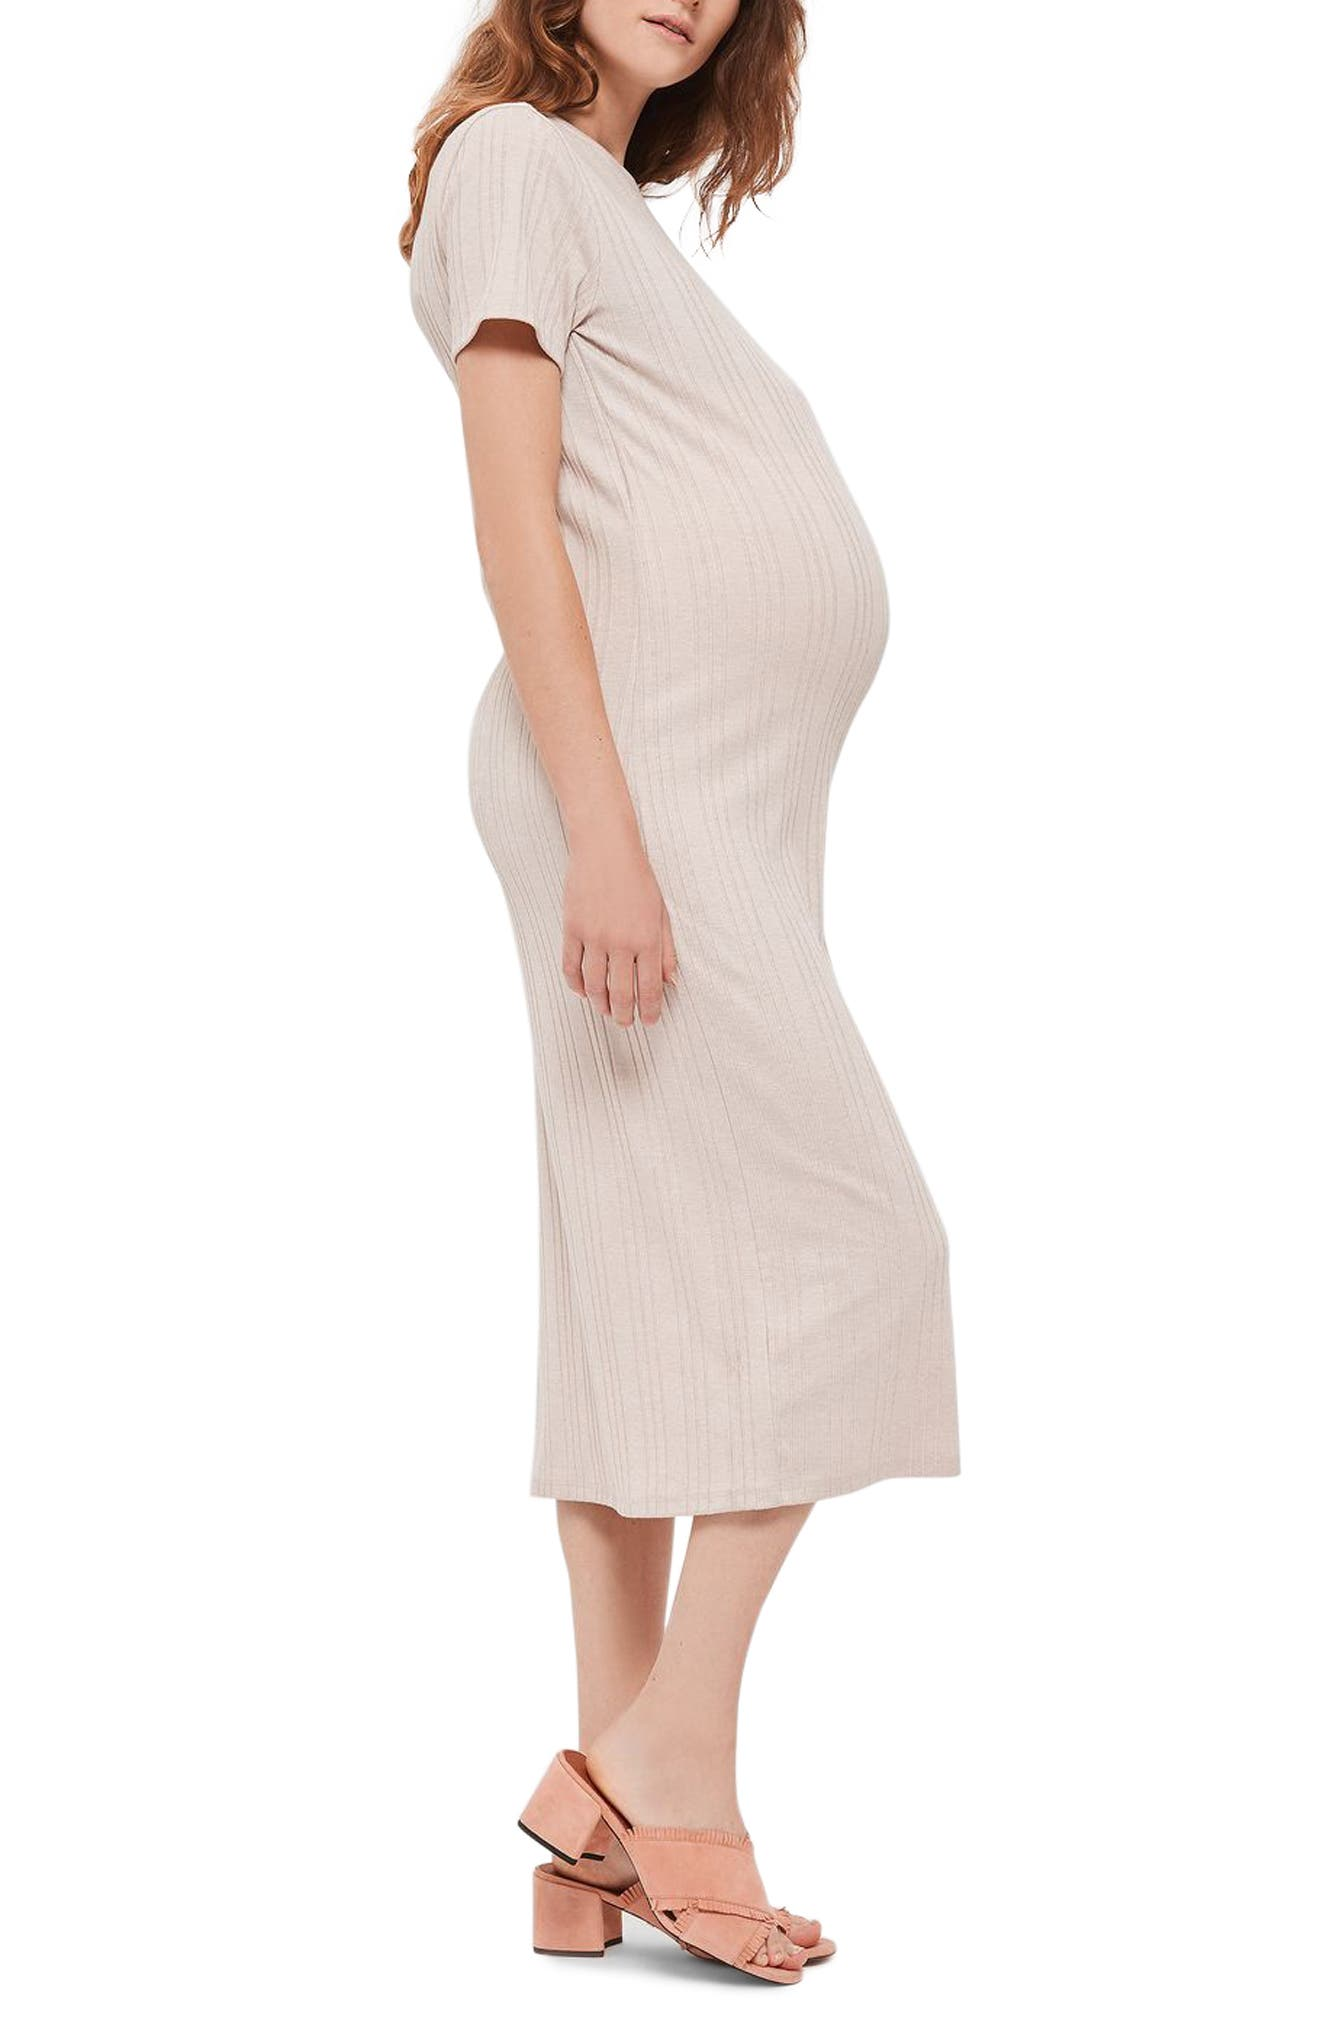 Topshop Ribbed Split Maternity Midi Dress